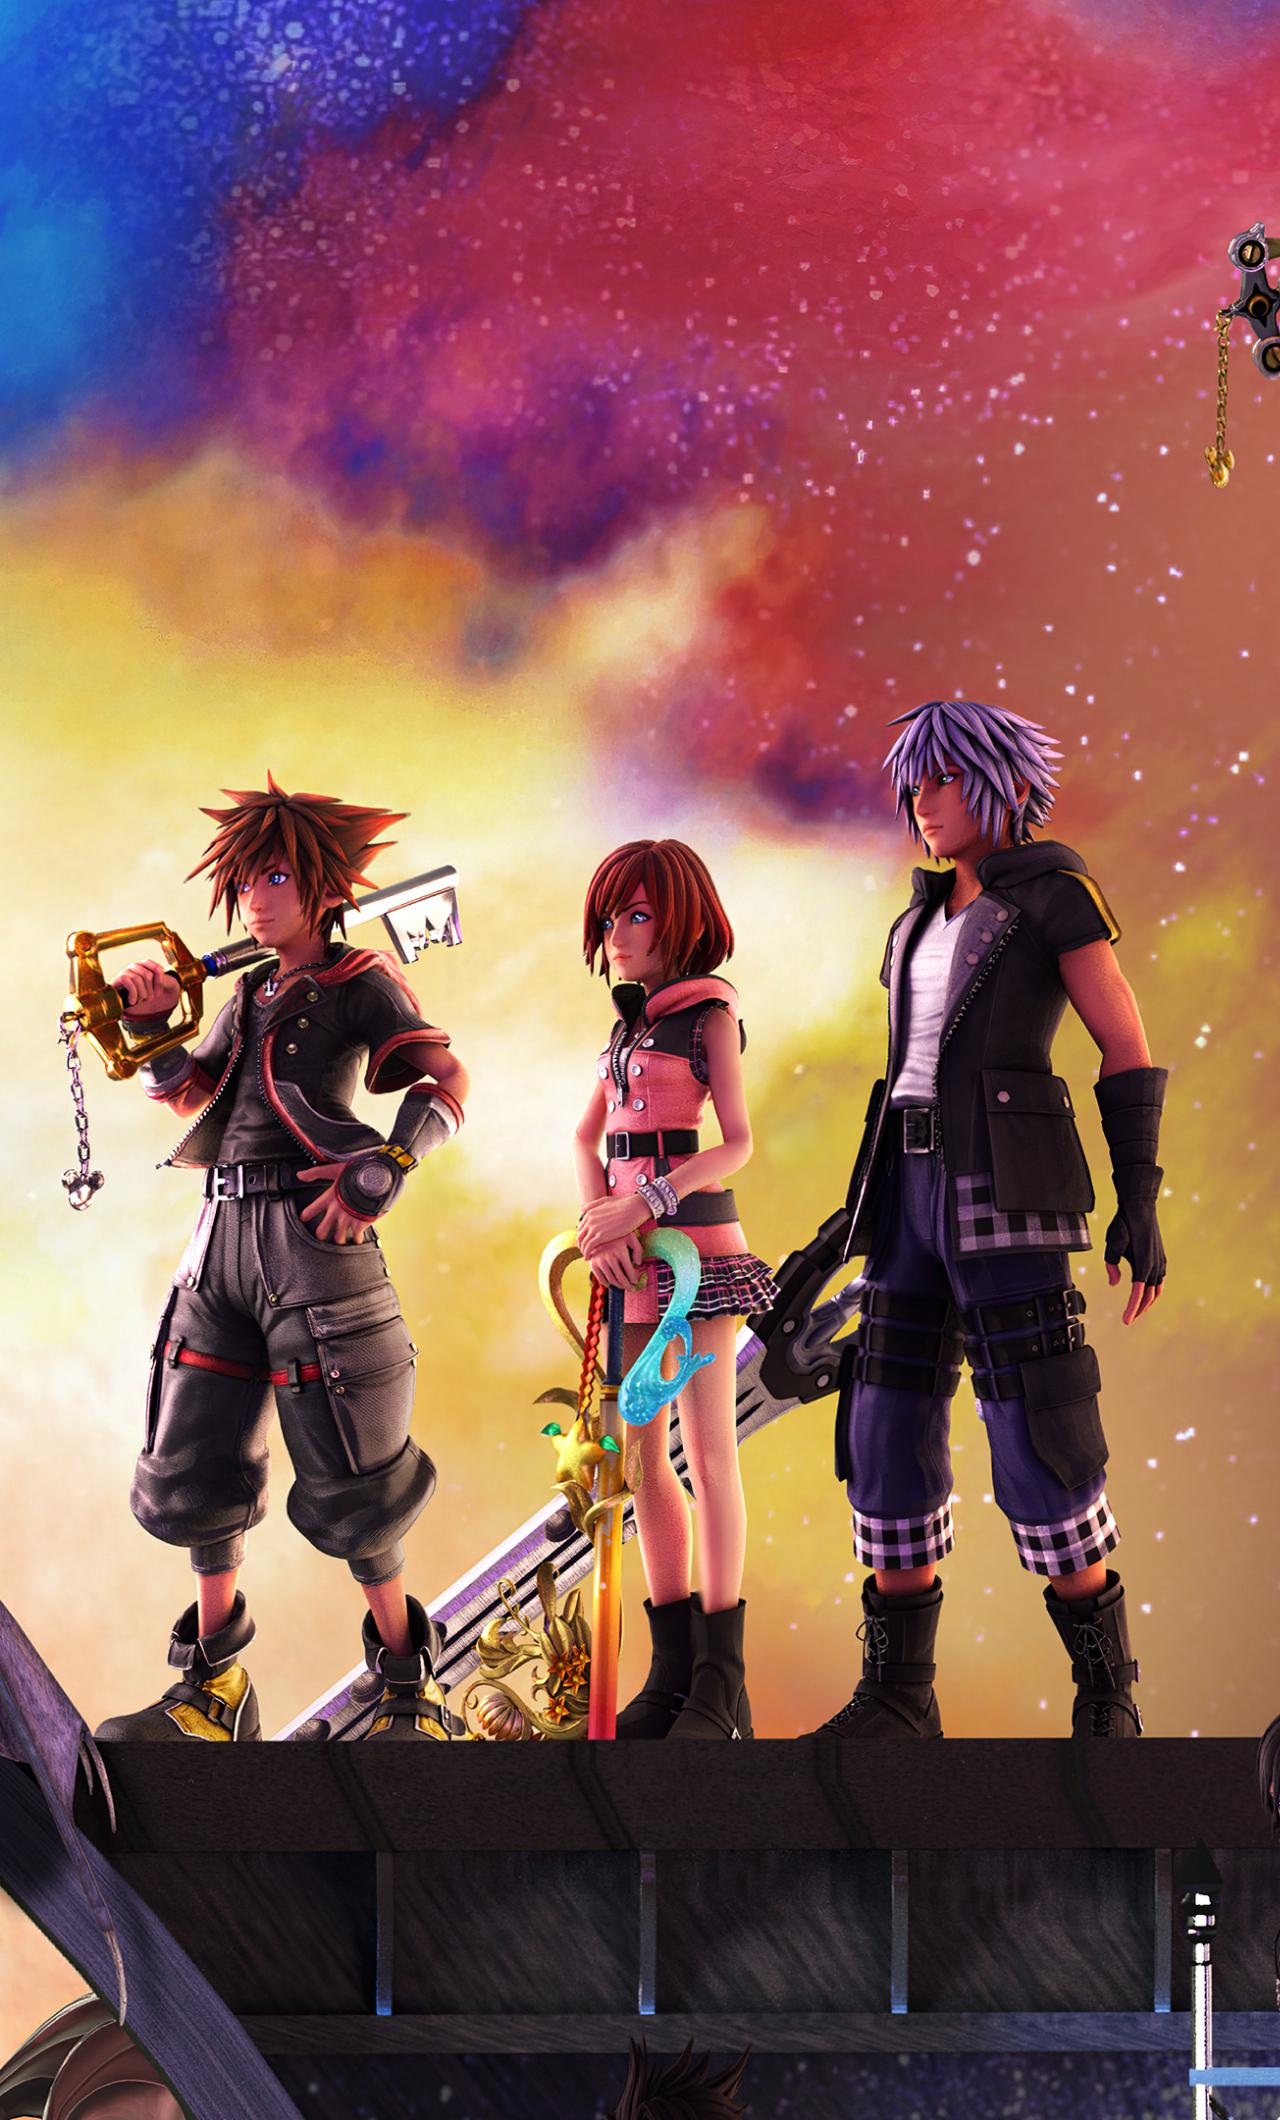 1280x2120 Kingdom Hearts 3 Iphone 6 Plus Wallpaper Hd Games 4k